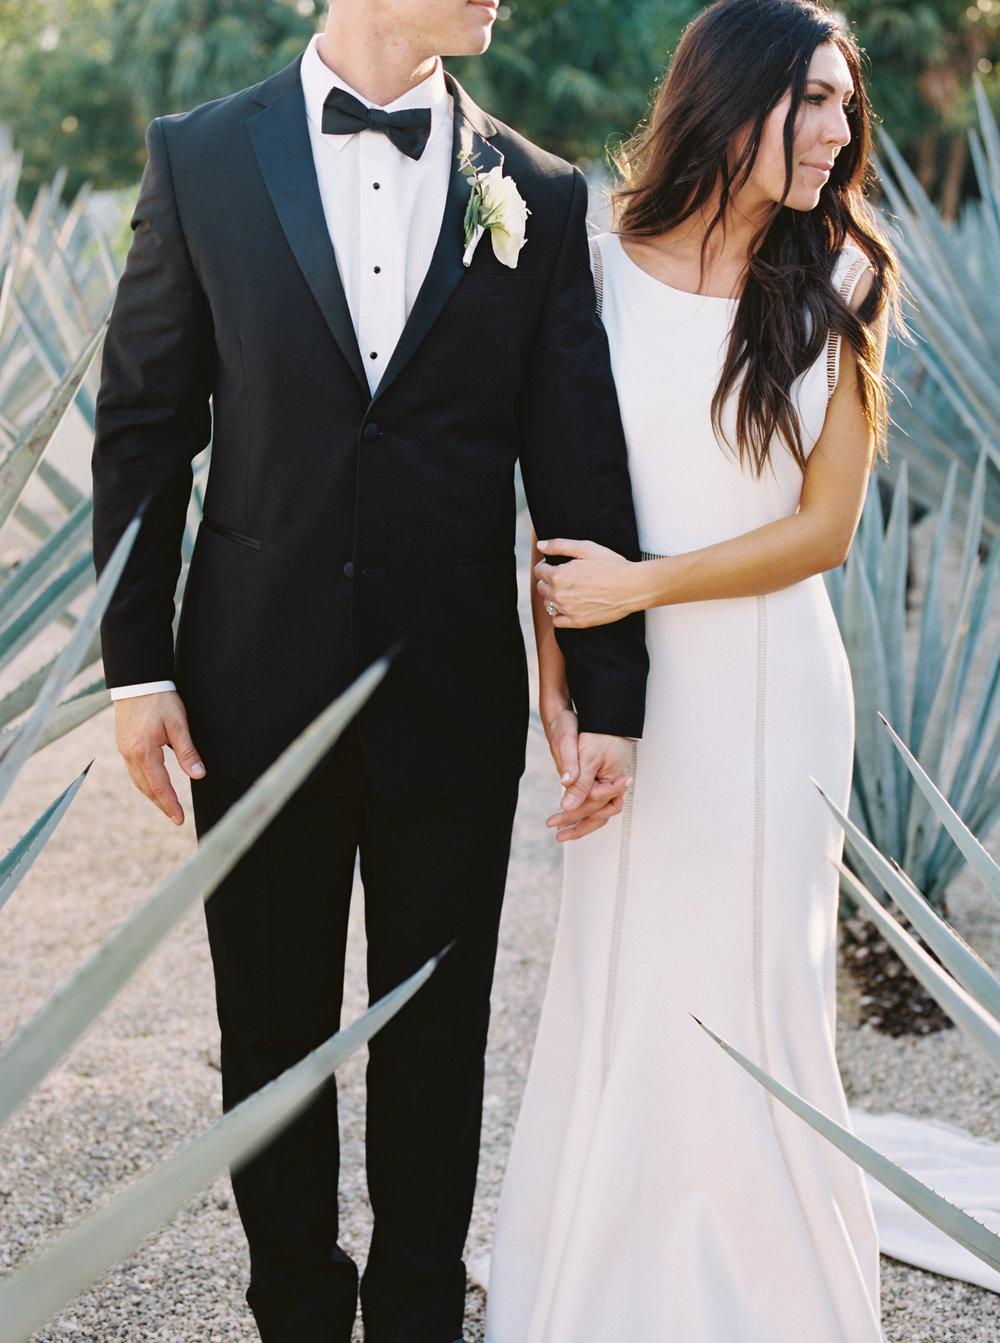 Kyle John l Fine Art Wedding Photography l Chicago, Copenhagen, California, New York, Destination l Blog l Brooke Boyd_The Film Poets_Tulum Wedding_23